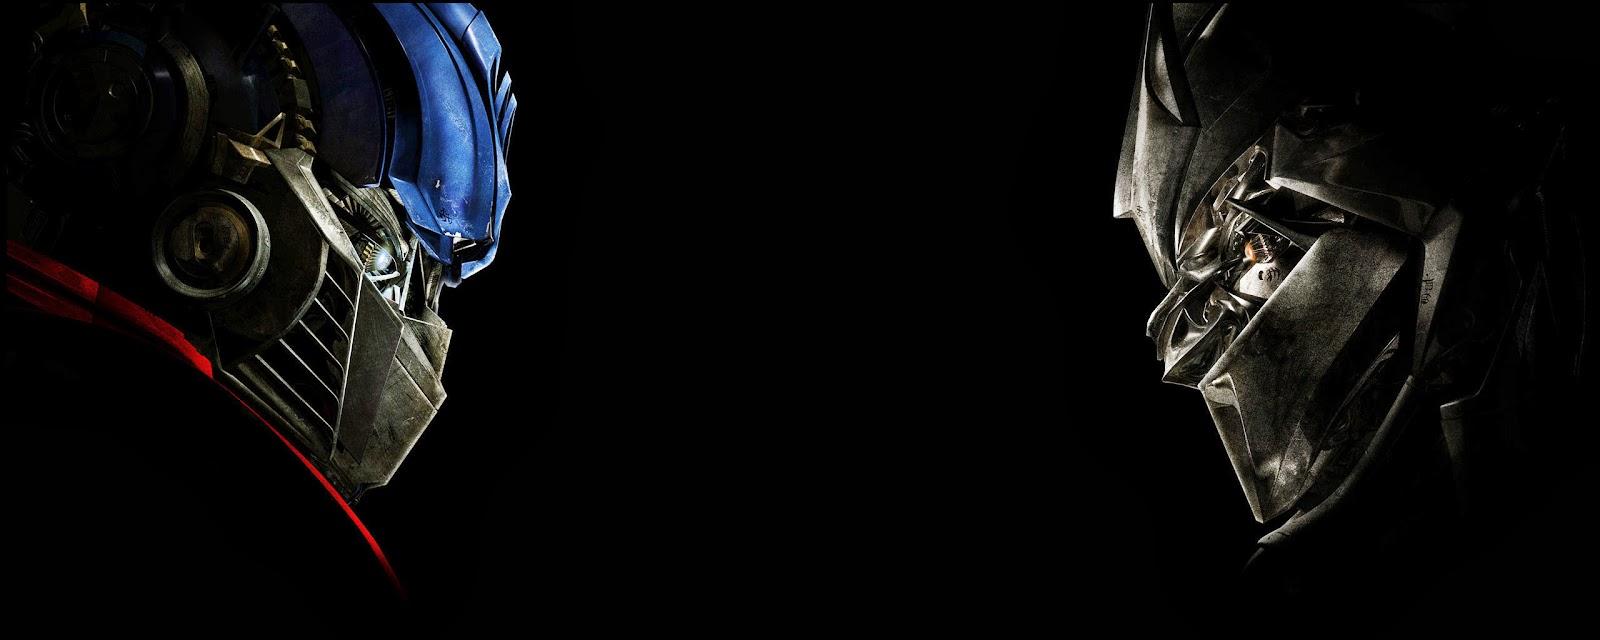 Pacman Wallpaper Iphone X Transformers 4 Wallpaper Dual Monitor Wallpaper Hd And